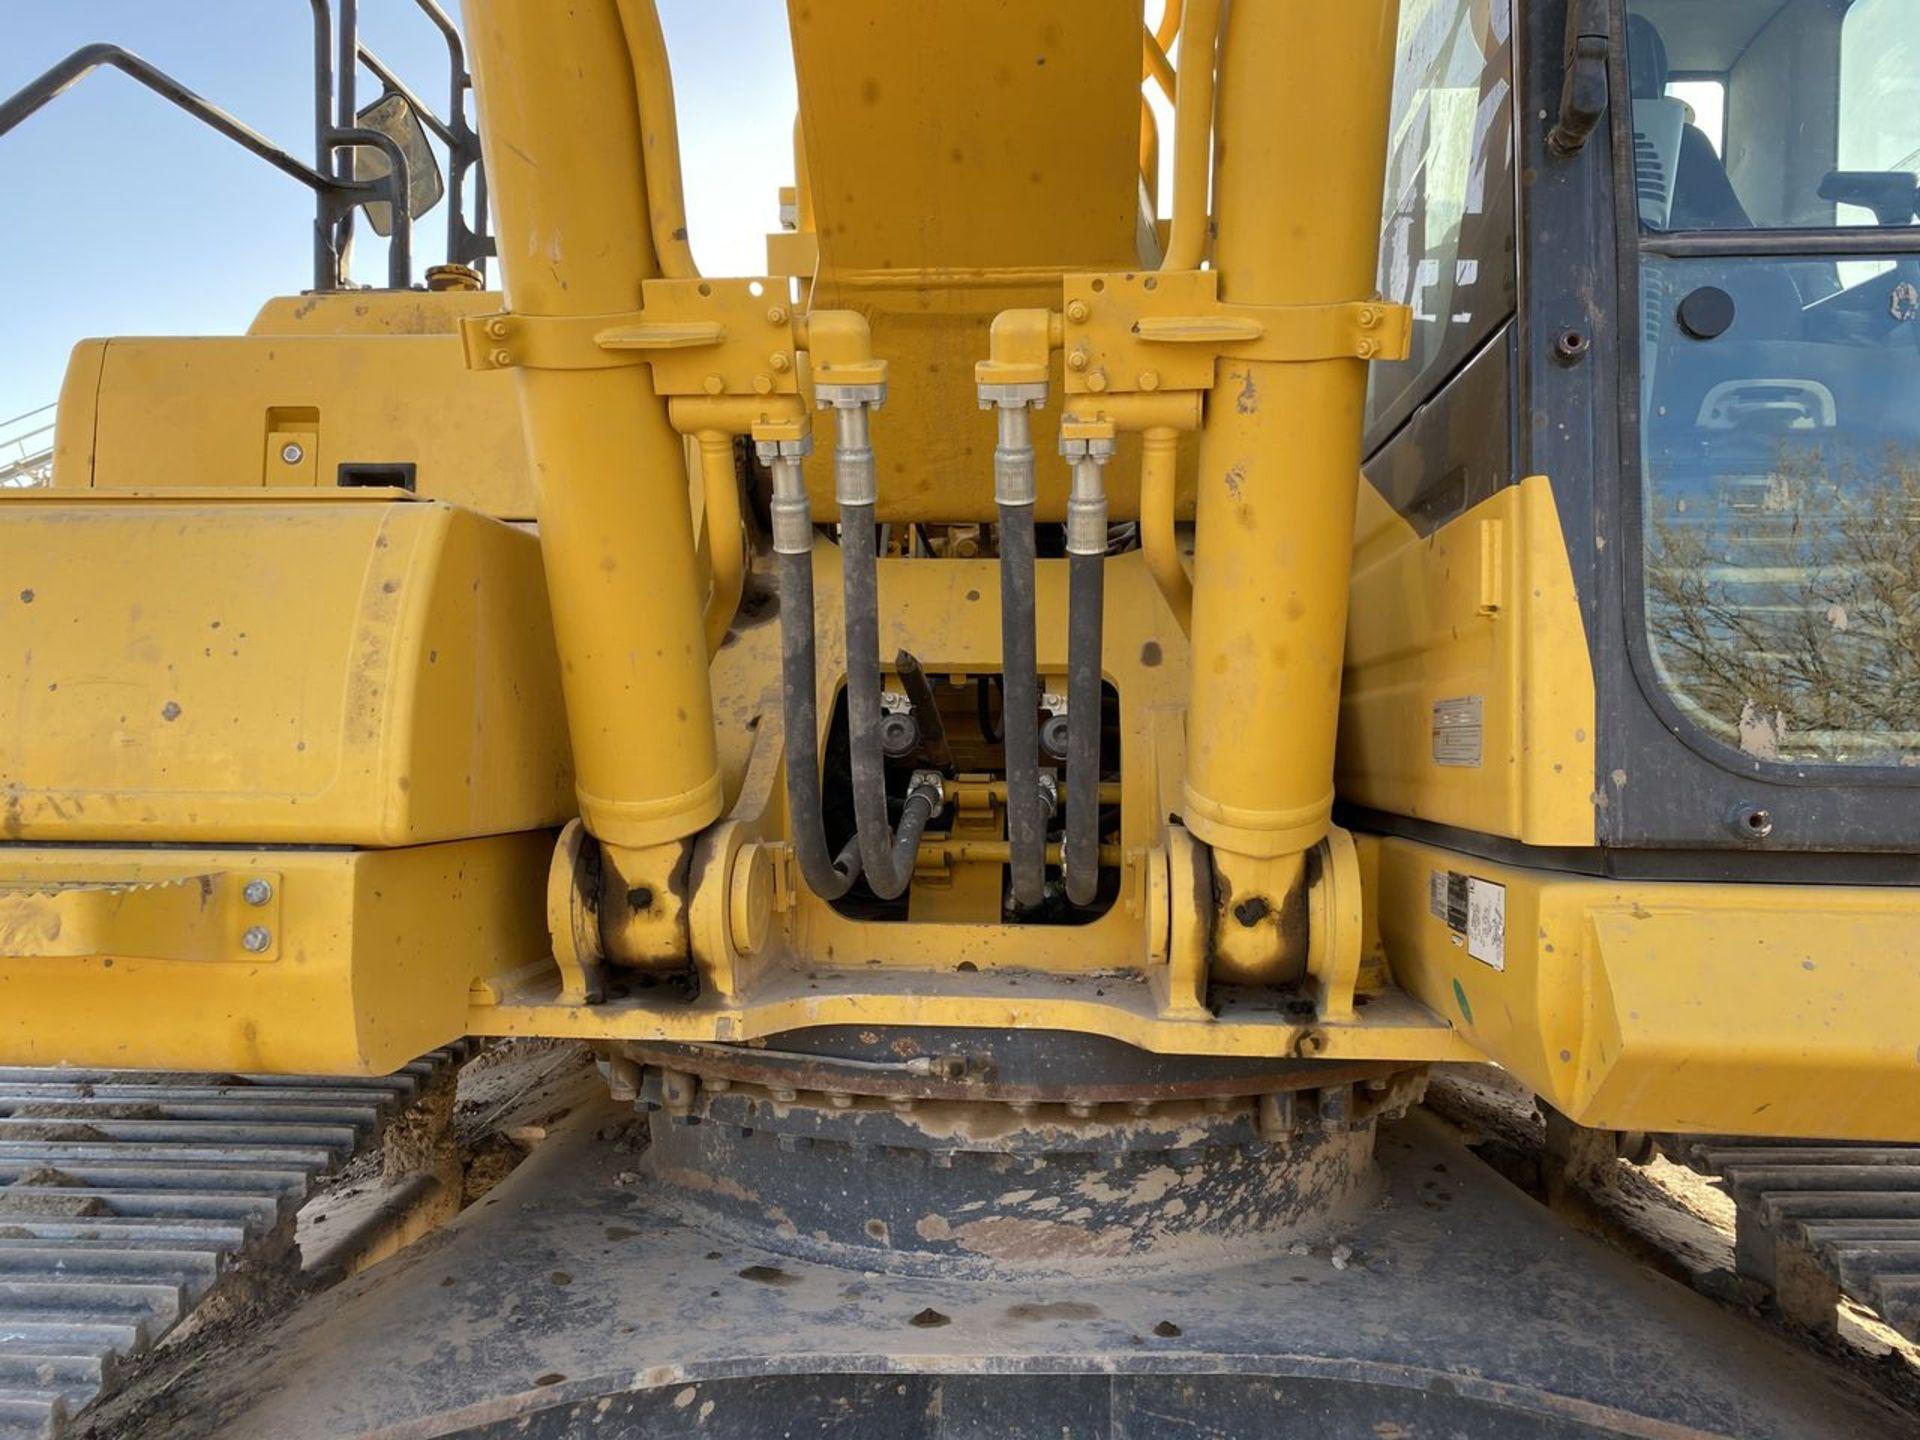 2018 Komatsu PC360LC-11 Hydraulic Crawler Excavator, S/N: A36863, PIN: KMTPC256CJWA36863; with 2,883 - Image 14 of 19